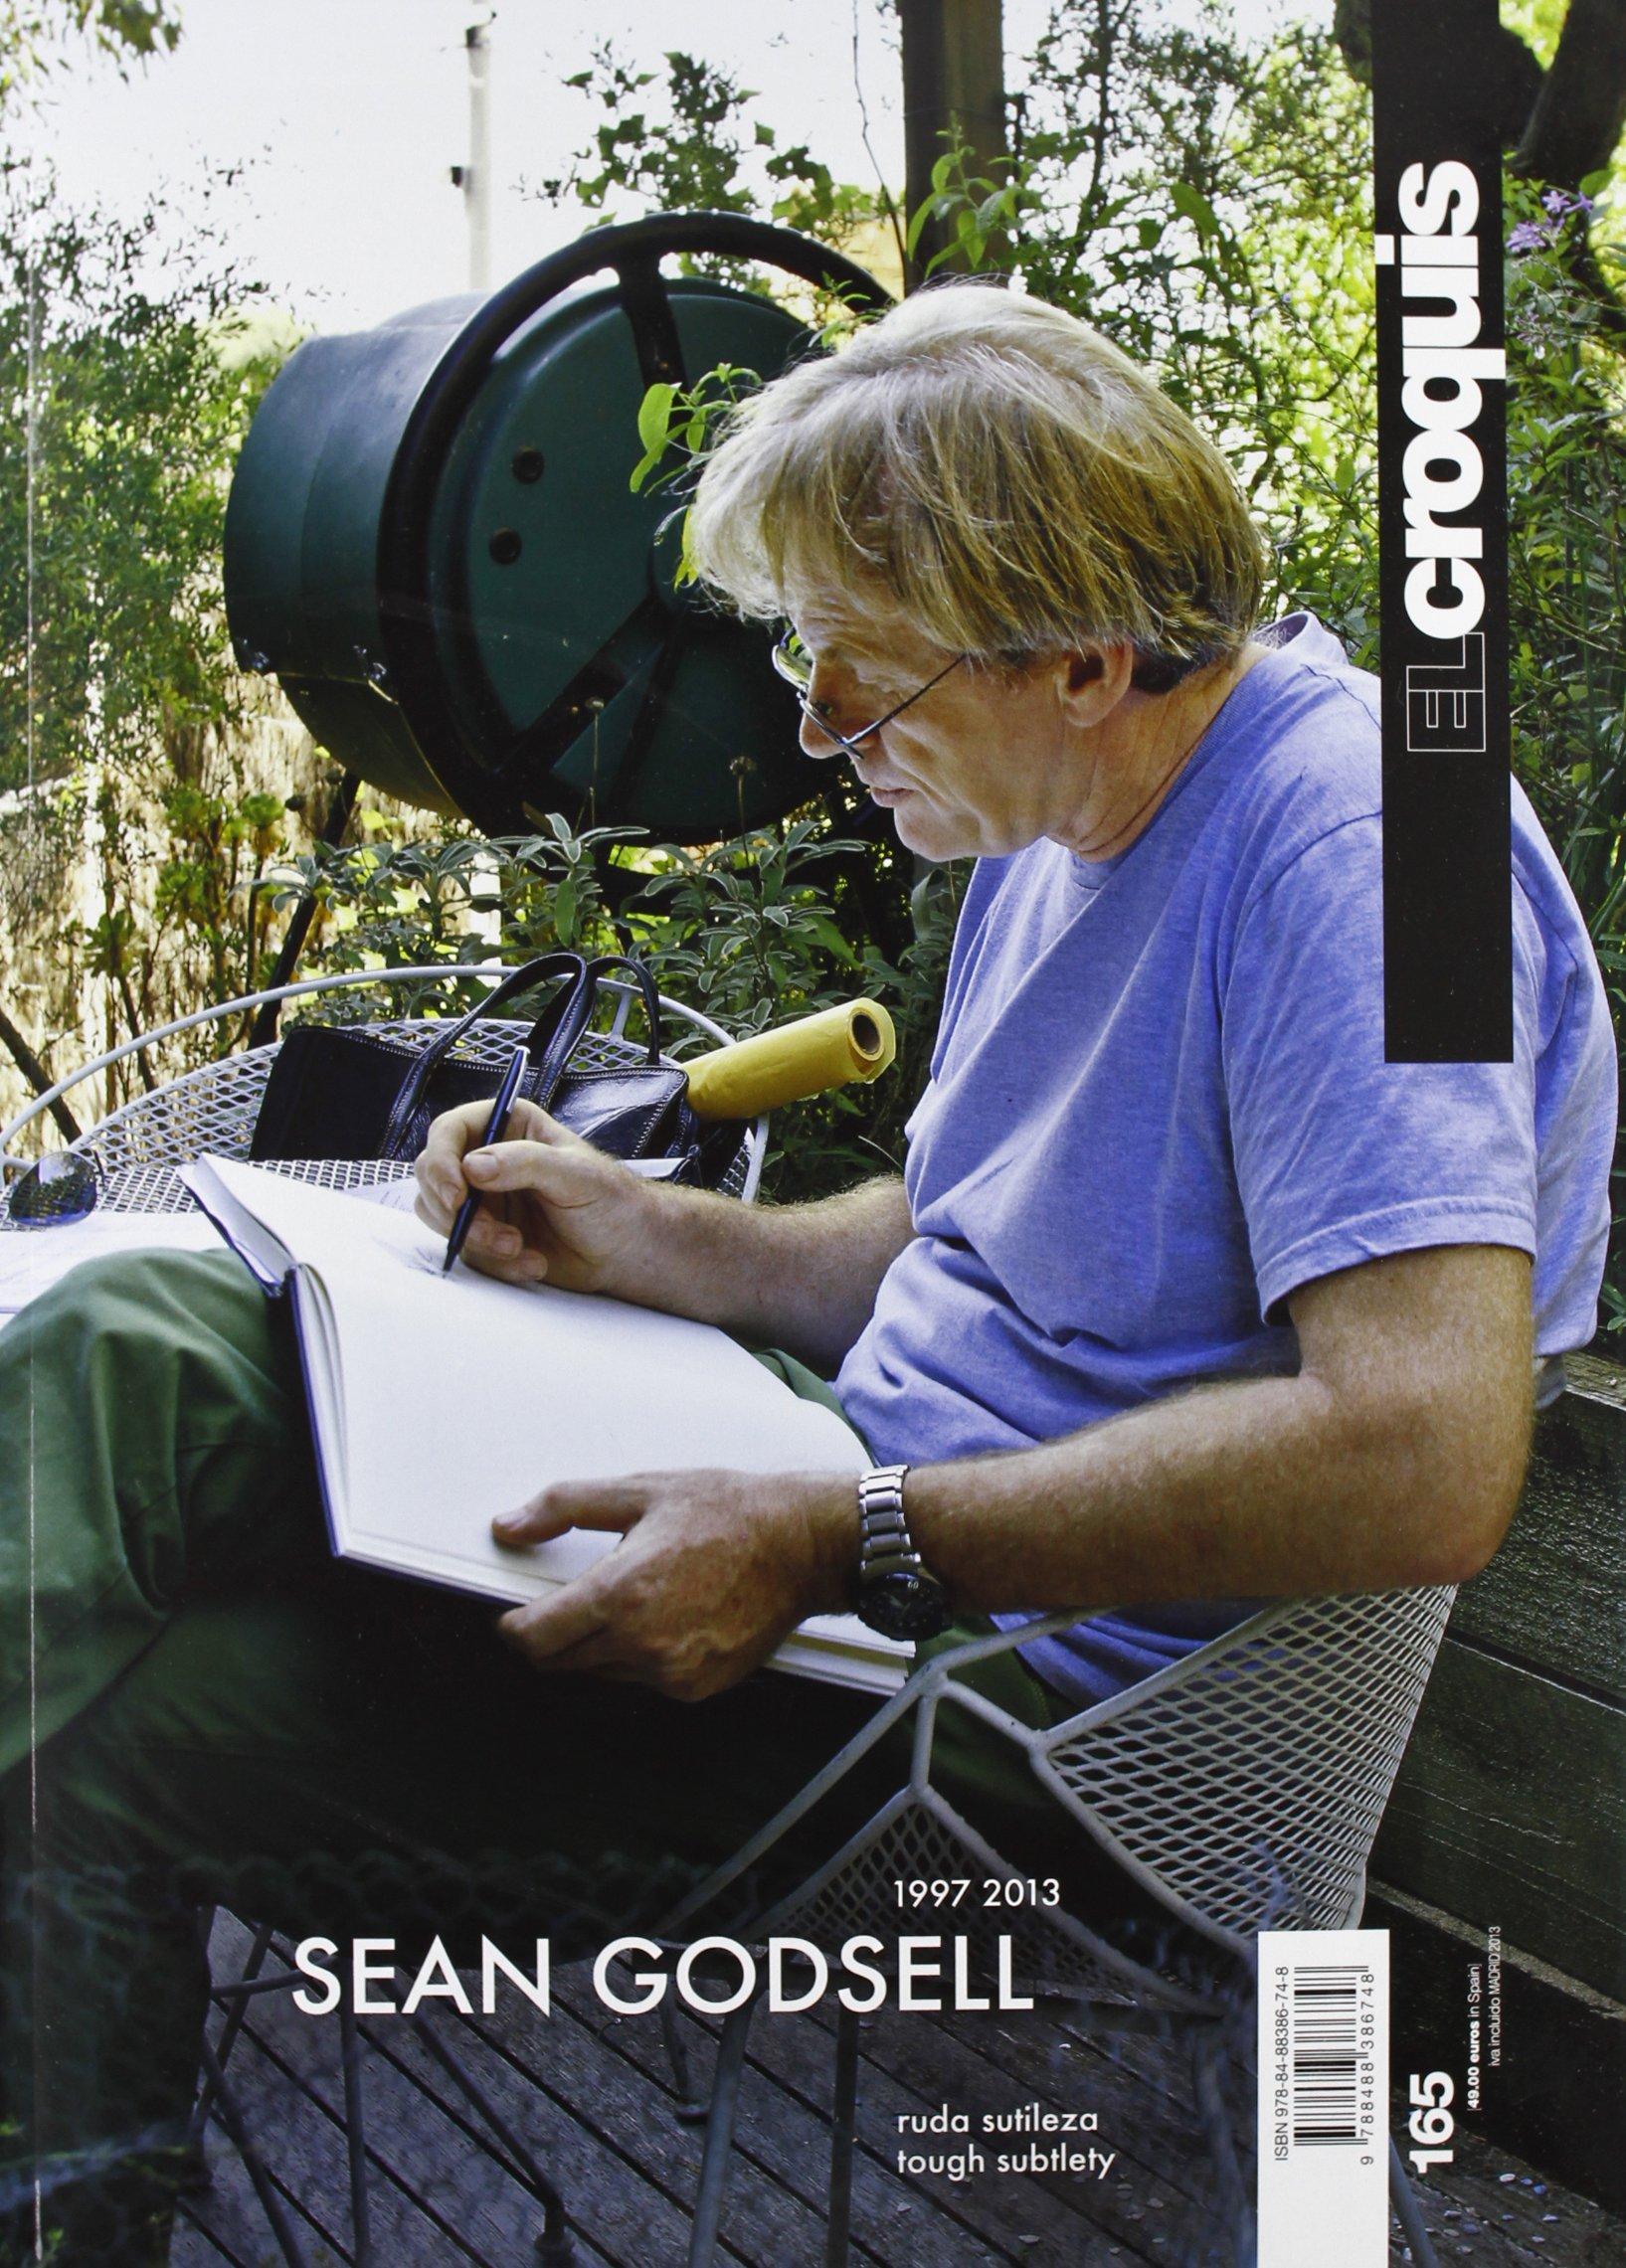 Sean Gosdell 1997-2013. Ediz. inglese e spagnola: Croquis 165 - Sean Godsell. 1997-2013 (Revista El Croquis) (Inglés) Tapa blanda – 25 ene 2013 Vv.Aa. 8488386745 Pubblicazioni in serie periodici